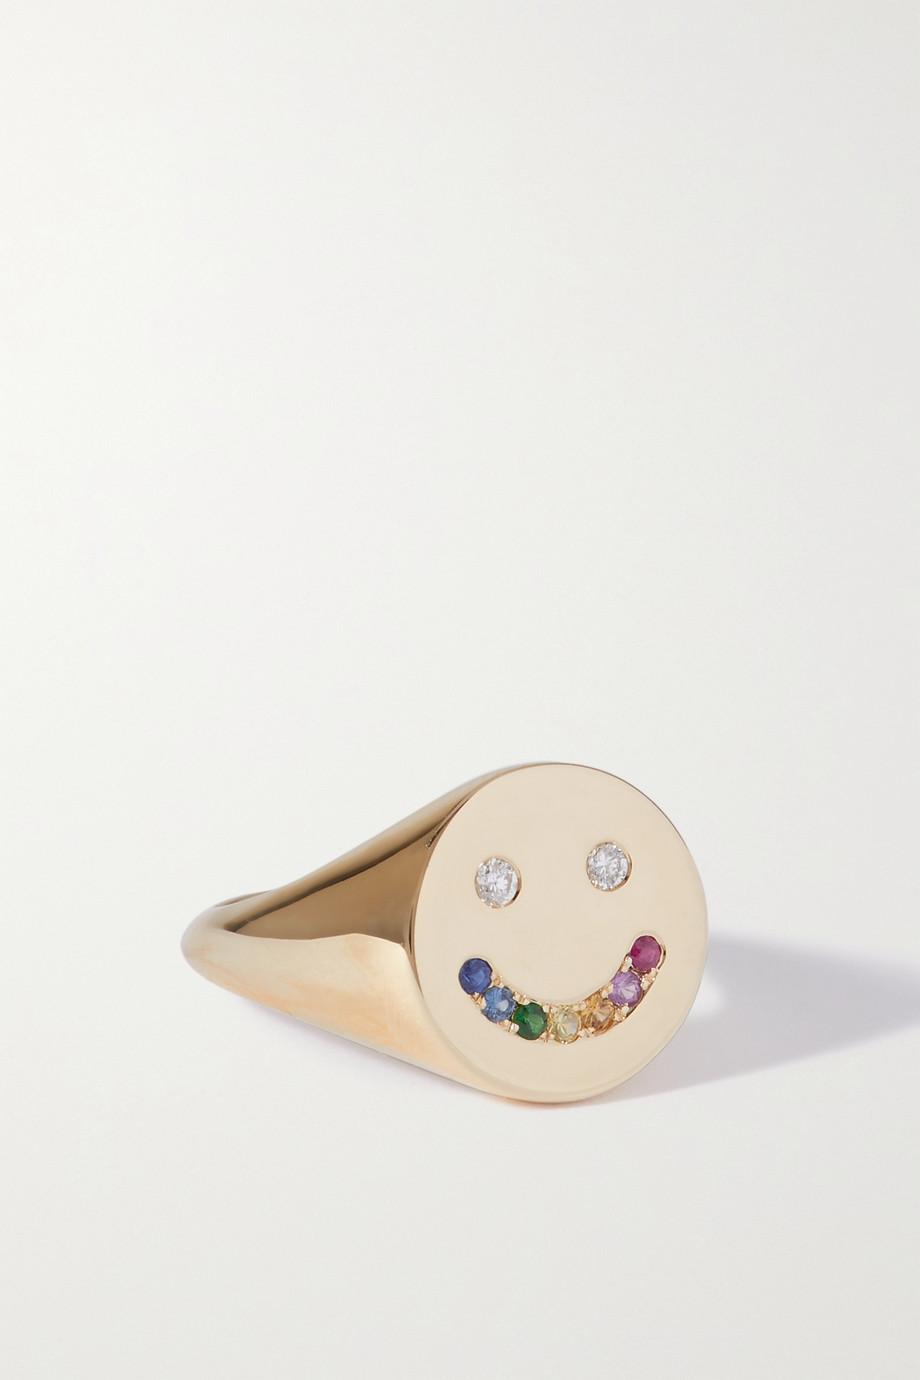 Roxanne First Bague en or 14 carats (585/1000), saphirs et diamants Rainbow Smiley